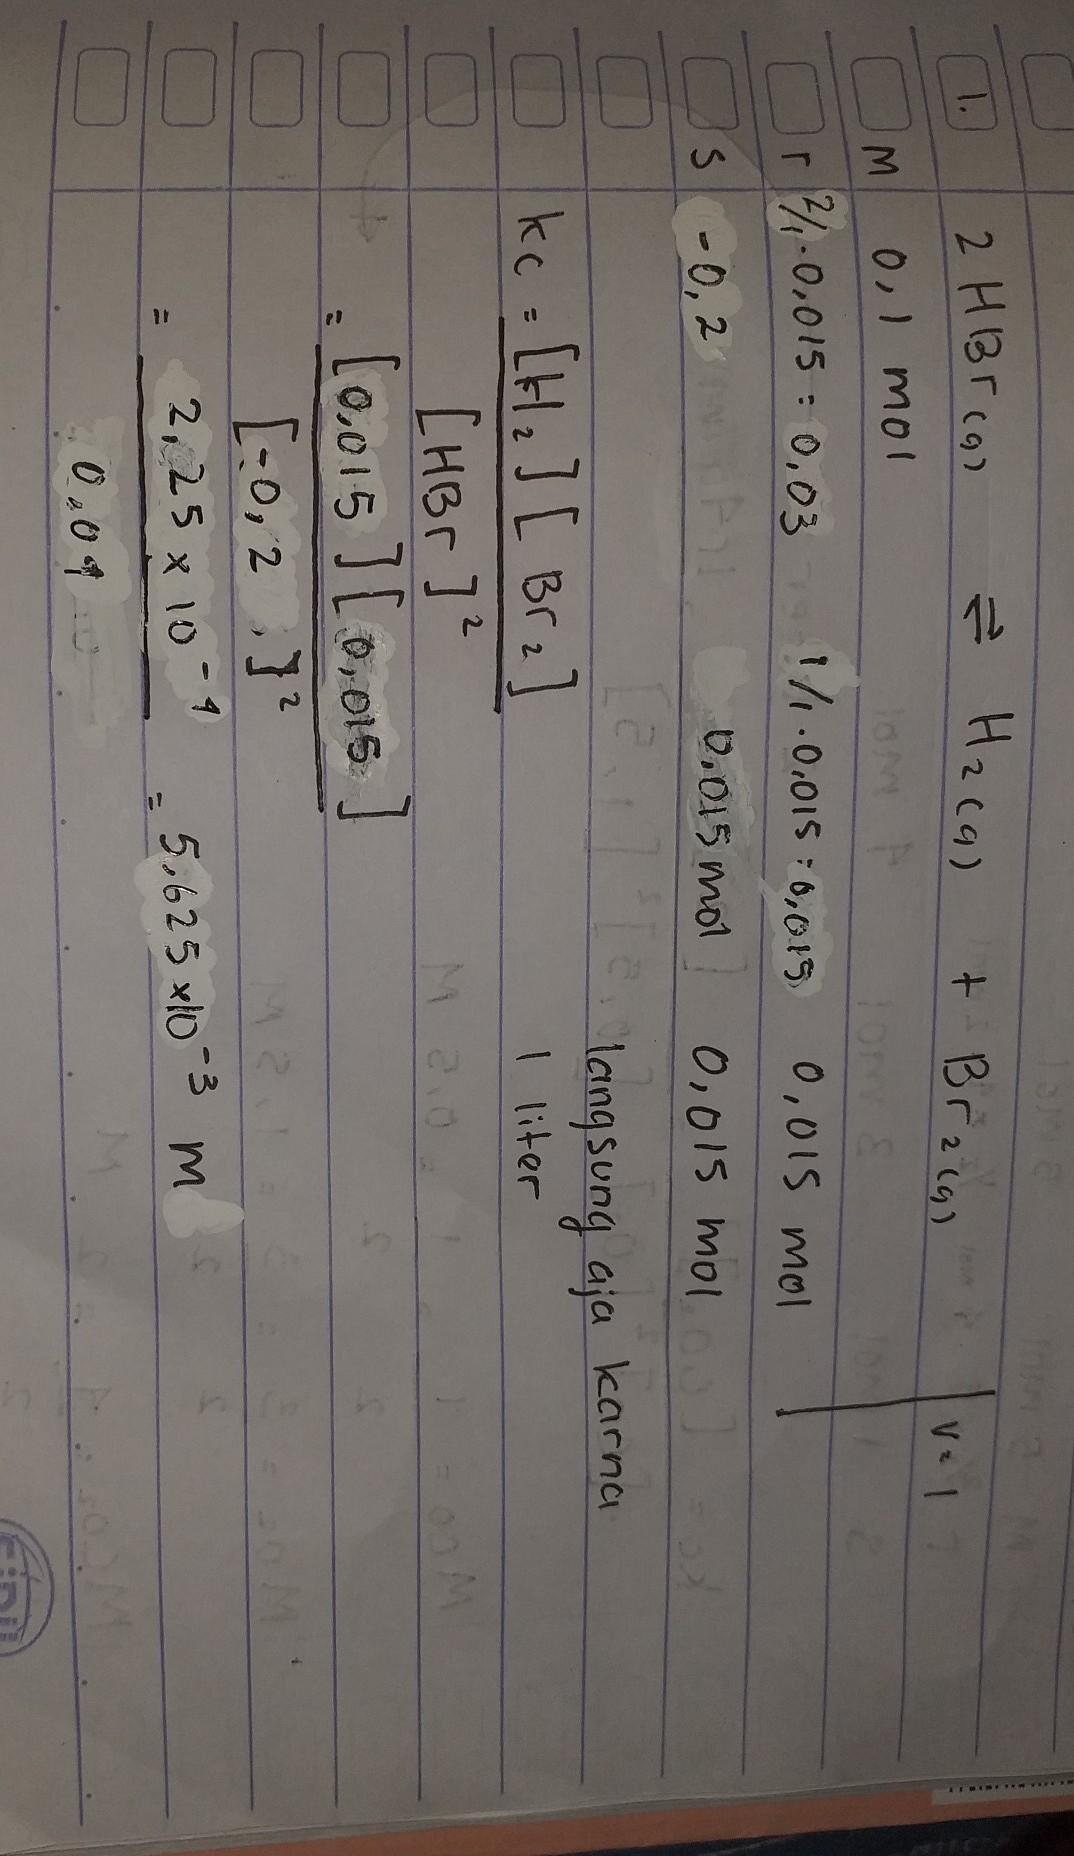 sebanyak 0,1 mol HBr dimasukan kedalam labu 1 liter dan ...